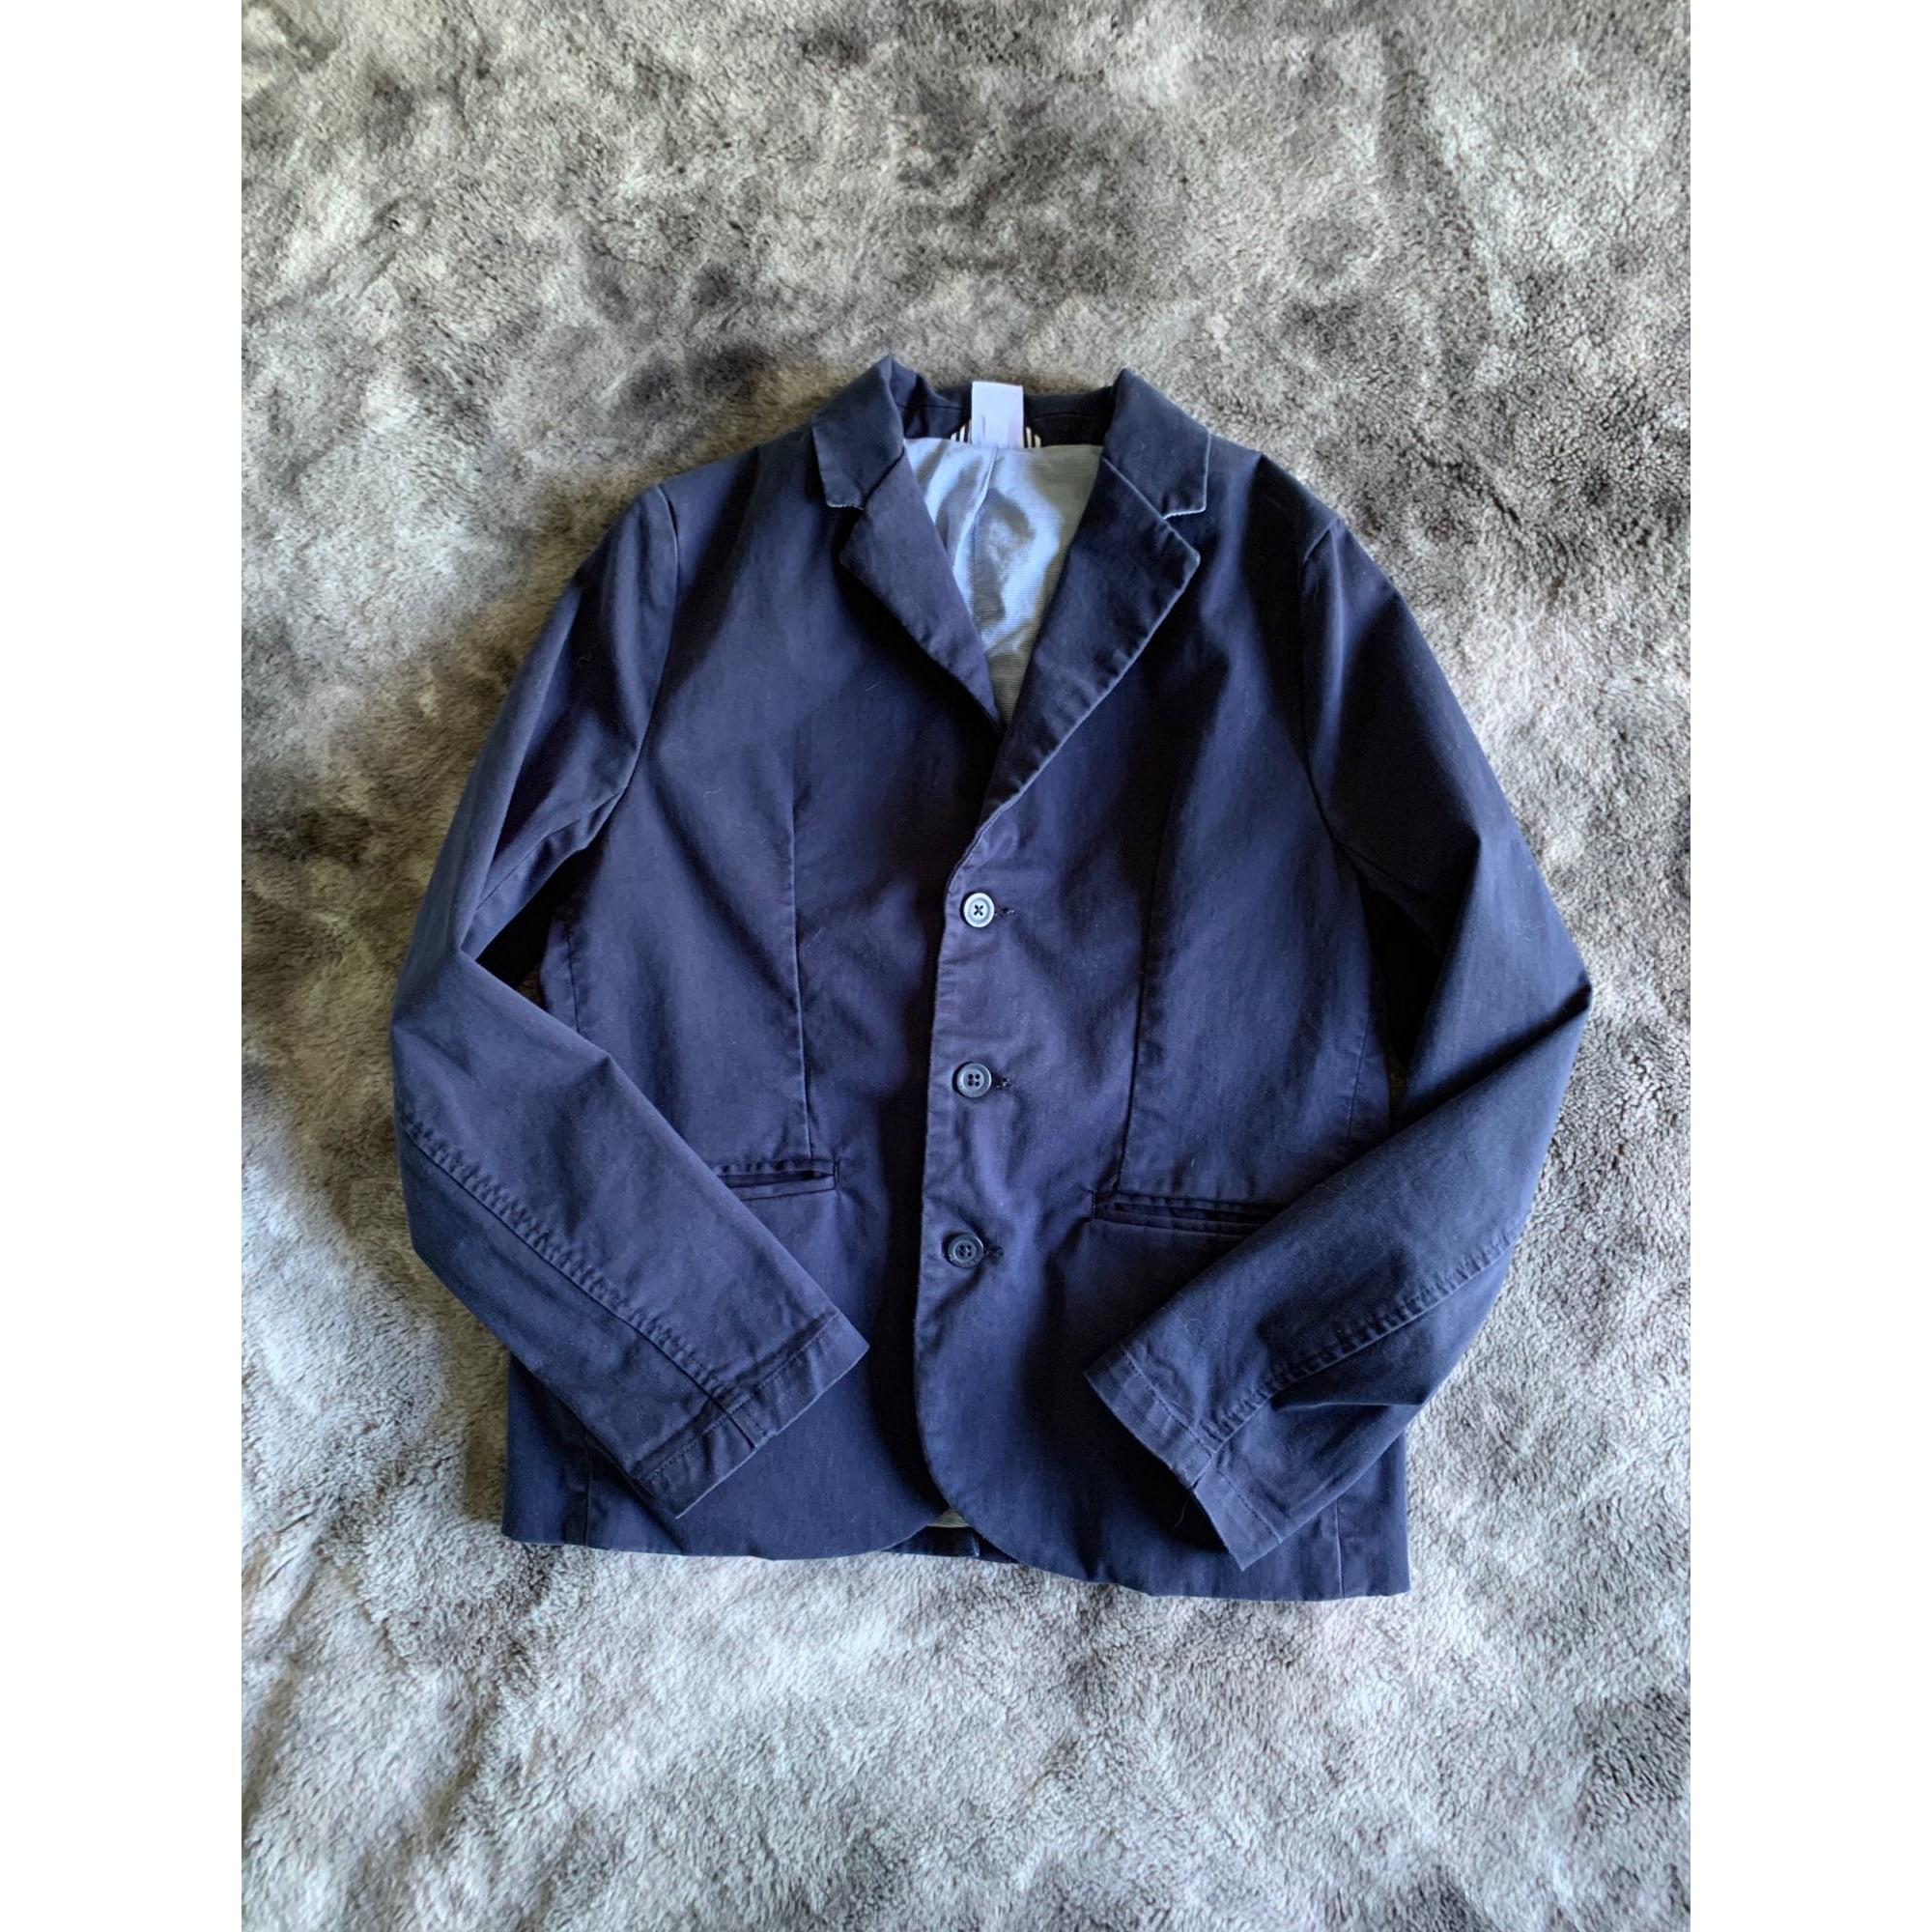 Veste PETIT BATEAU Bleu, bleu marine, bleu turquoise